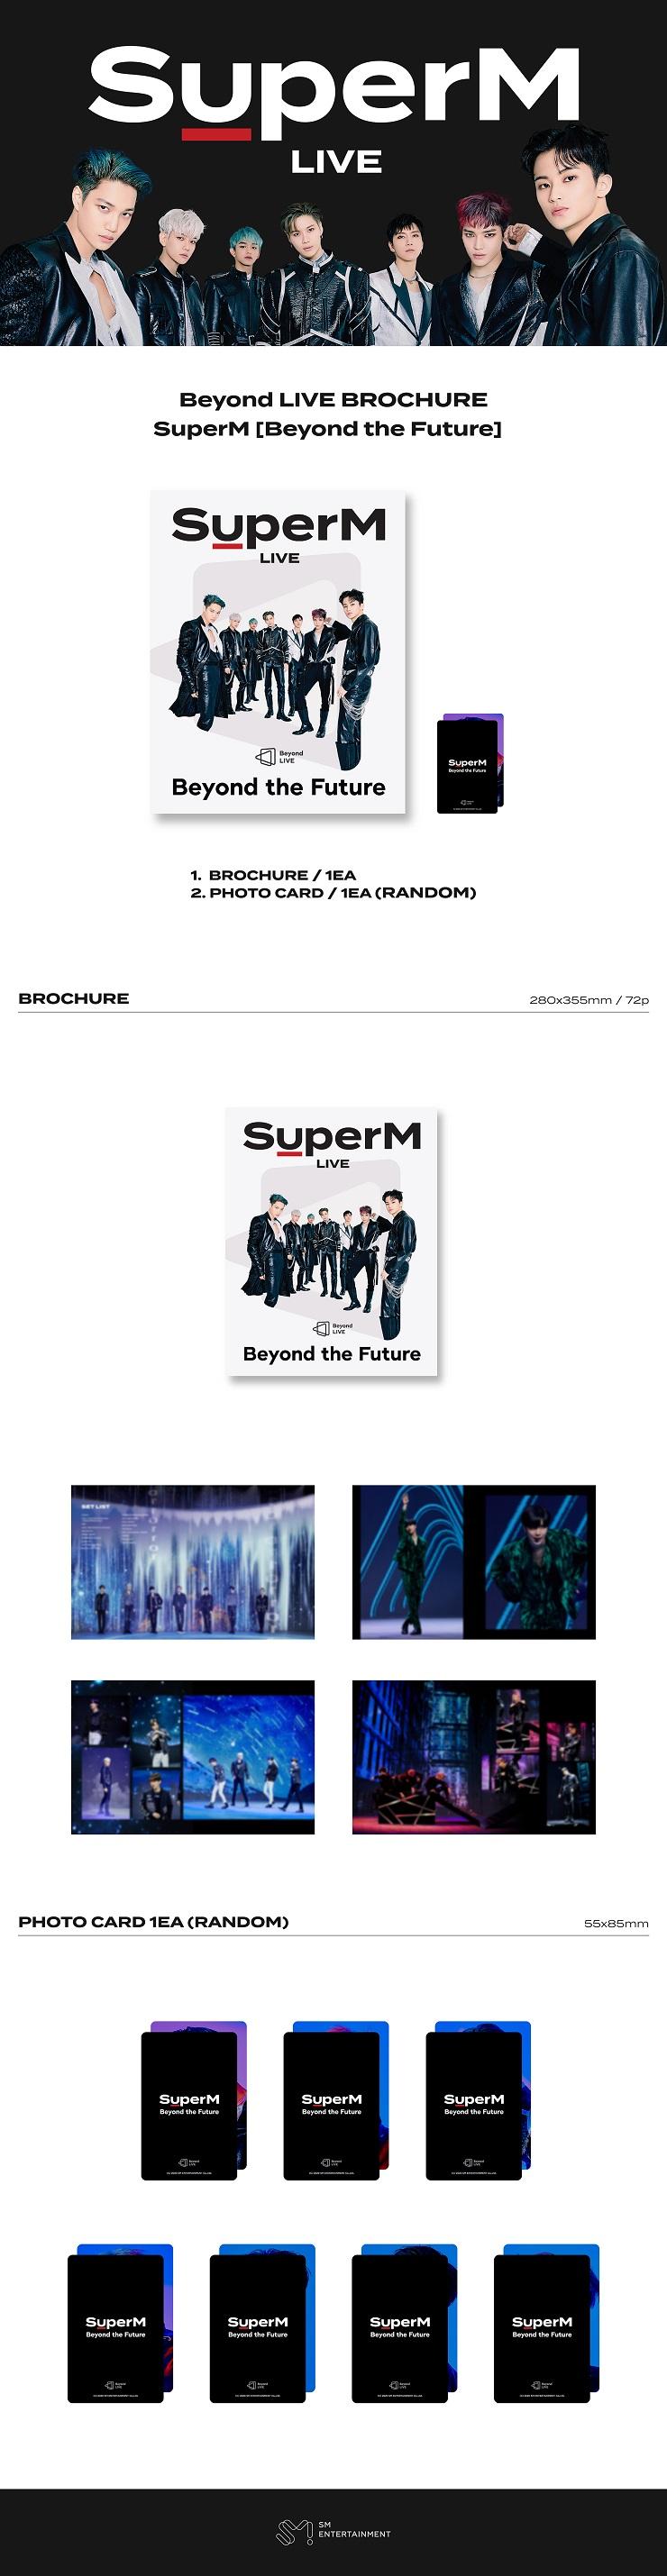 SuperM(슈퍼엠) - Beyond LIVE BROCHURE SuperM [Beyond the Future]